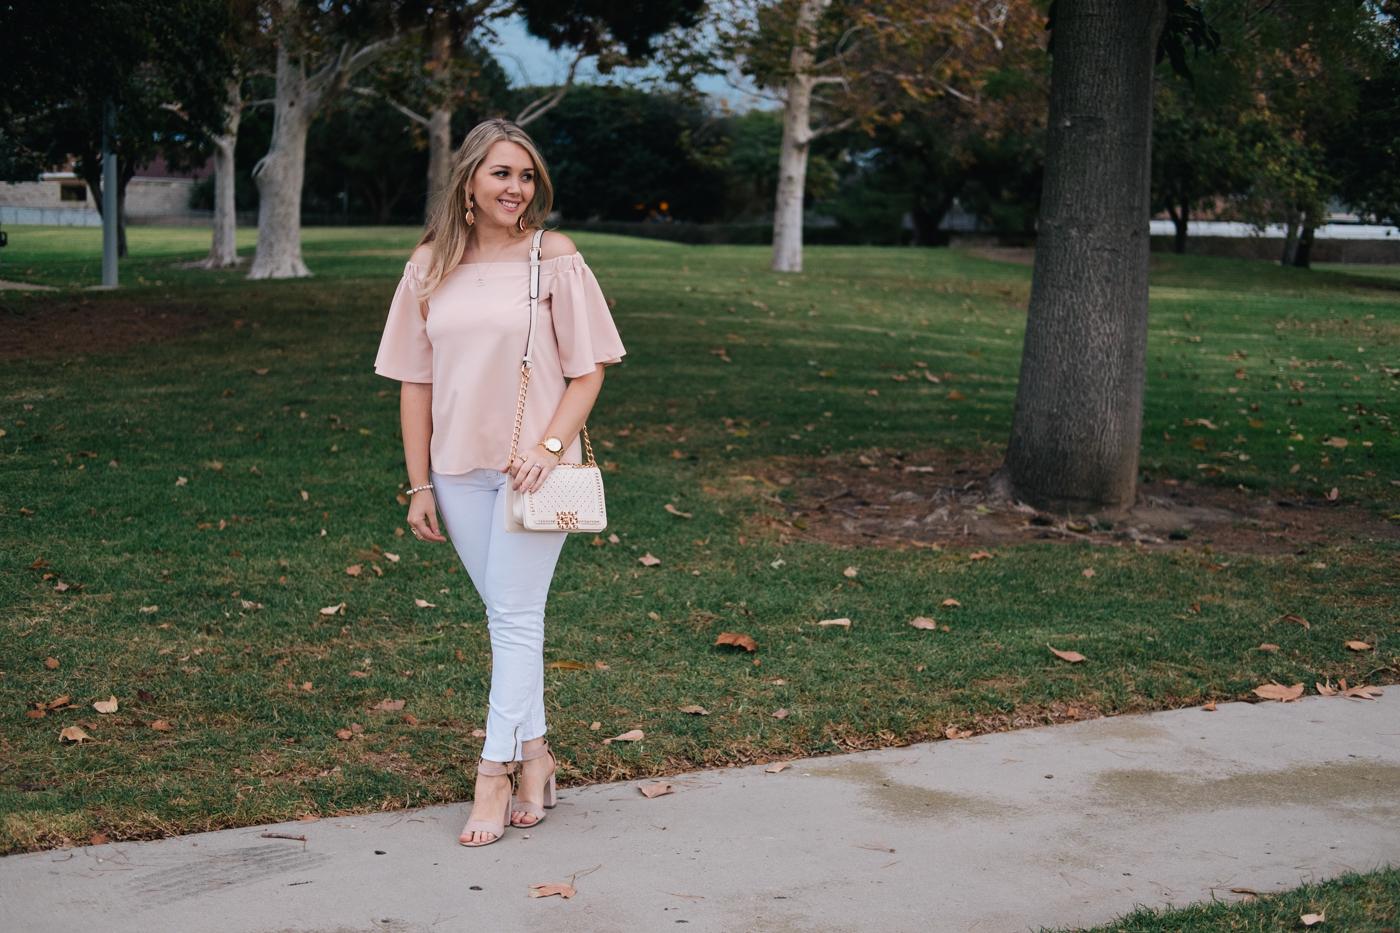 Debora Dahl at the park wearing off the shoulder blouse in pastel colors